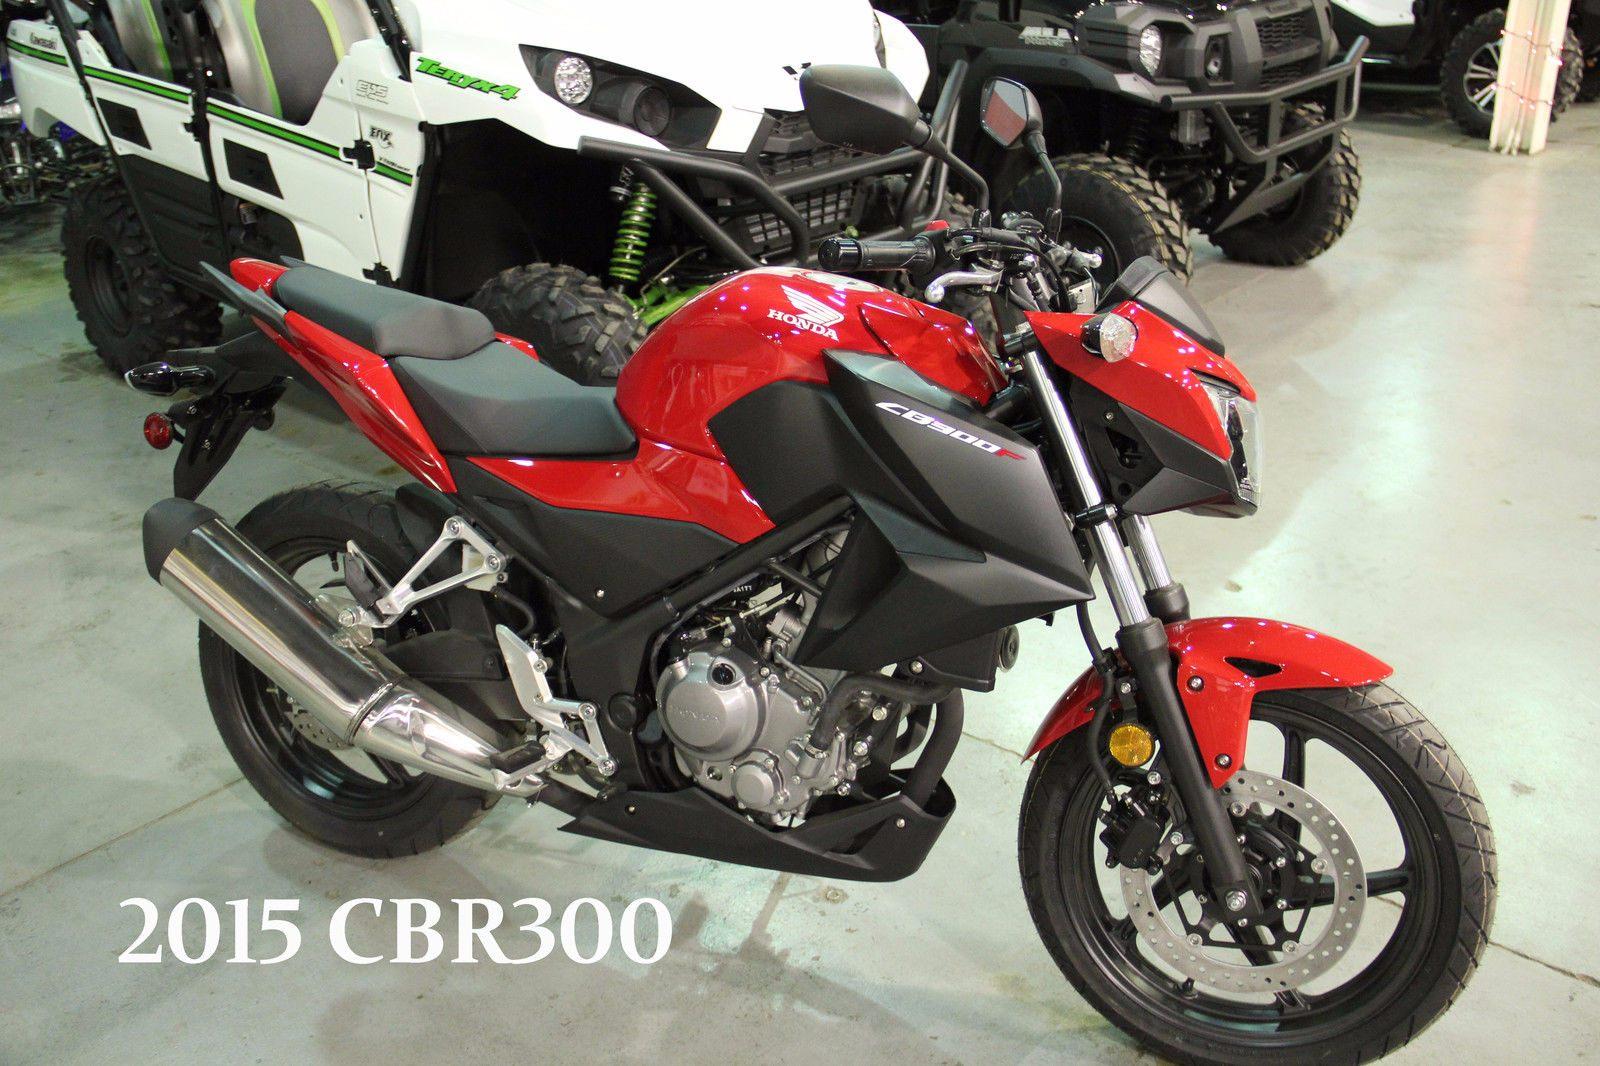 2015 honda cb300f motorcycles brilliant ohio call 740-296-3496